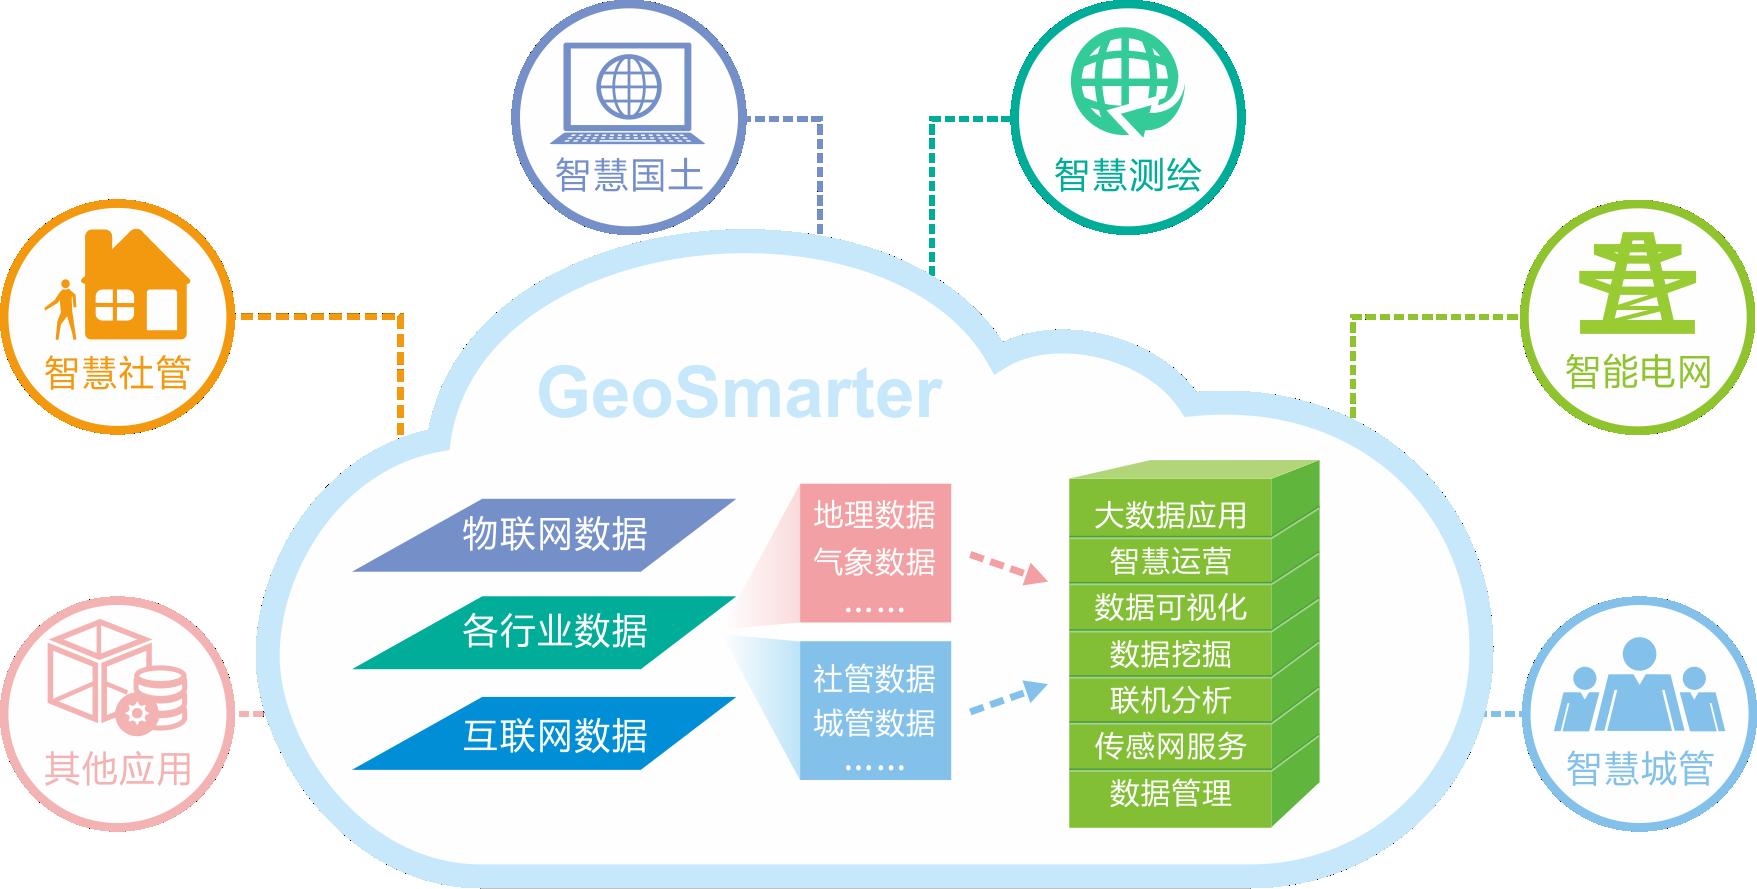 GeoSmarter-产品概述